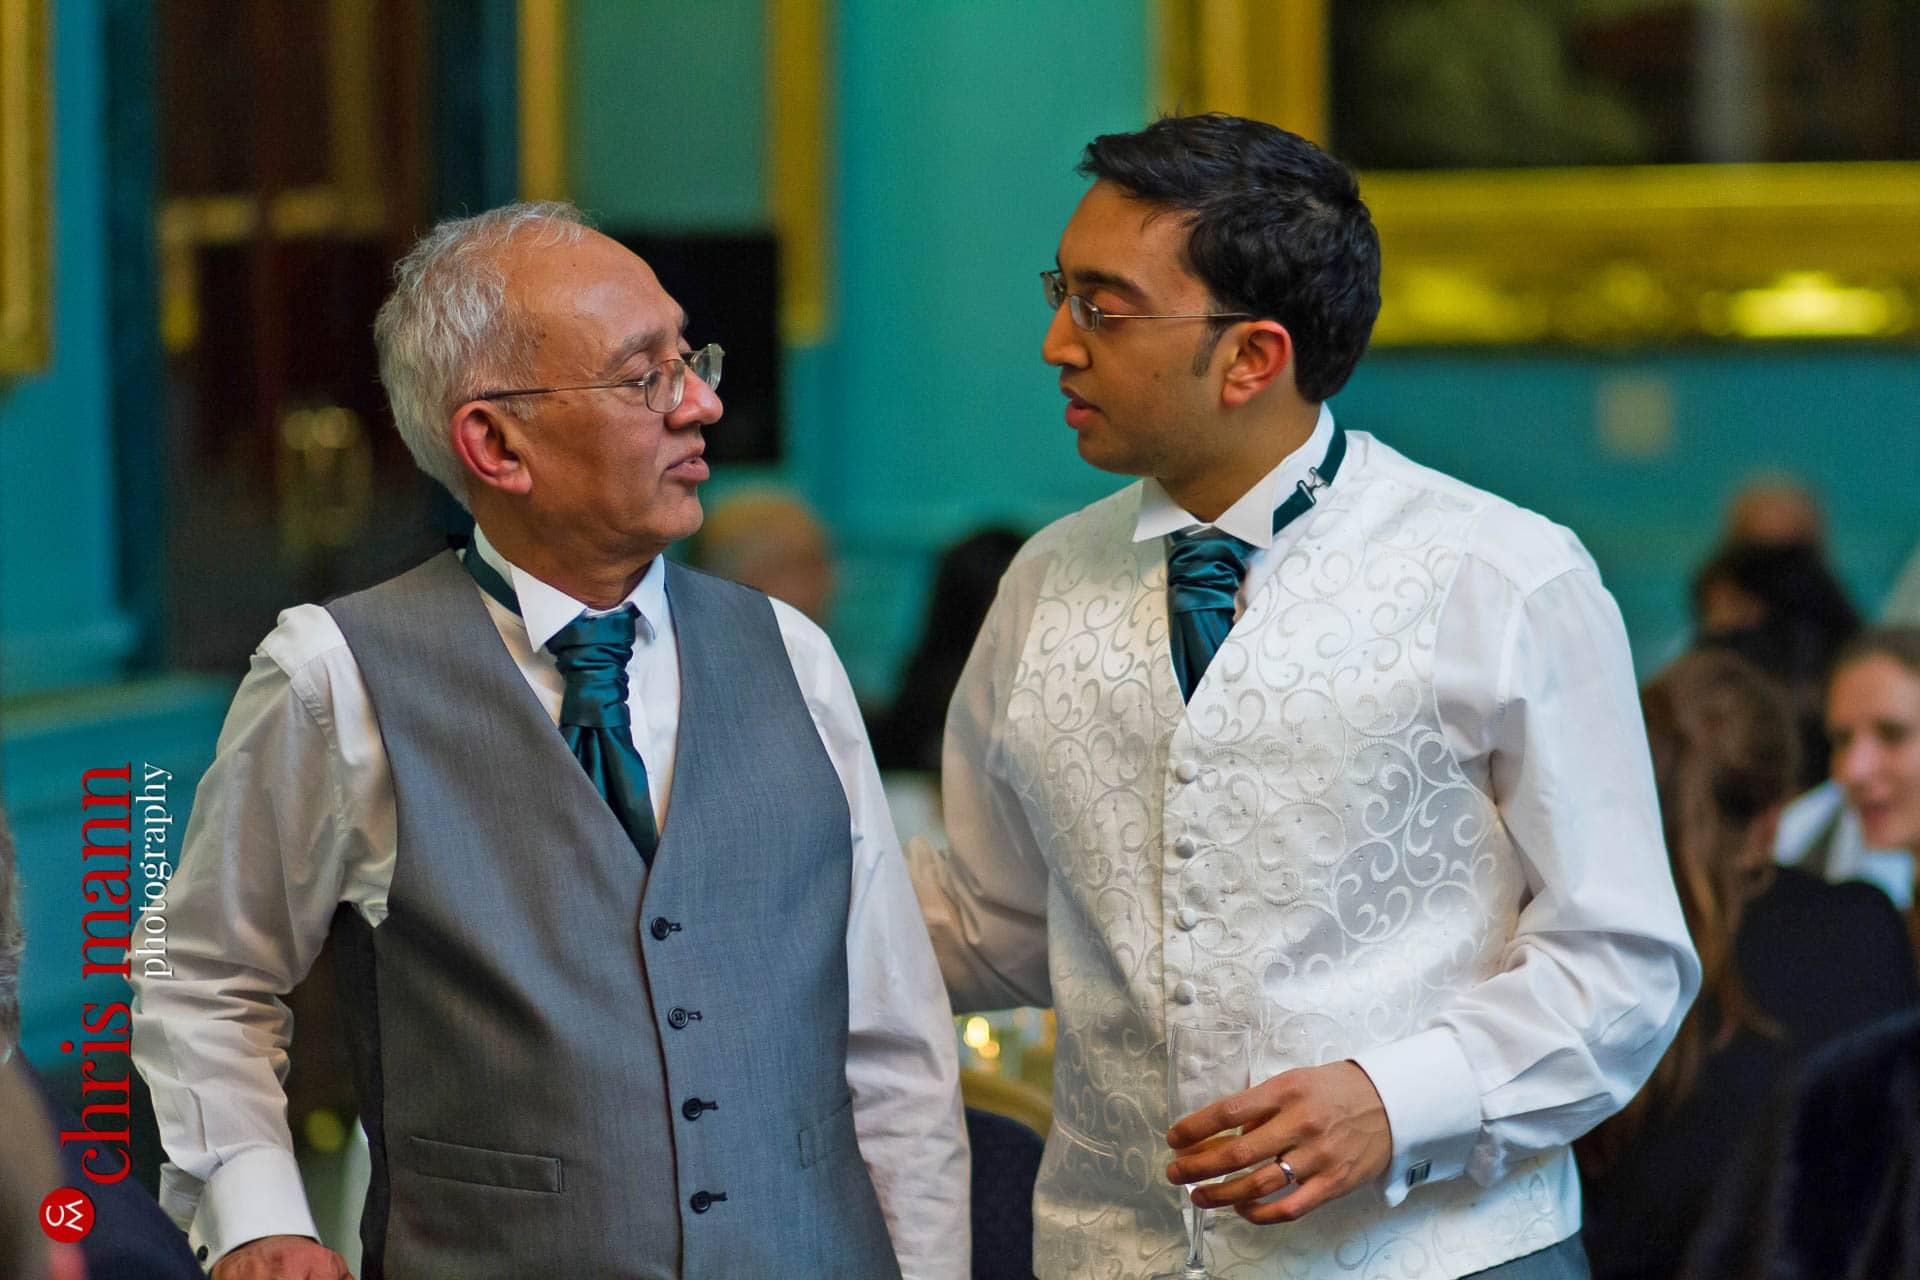 London-Hindu-wedding-IOD-Pall-Mall-040